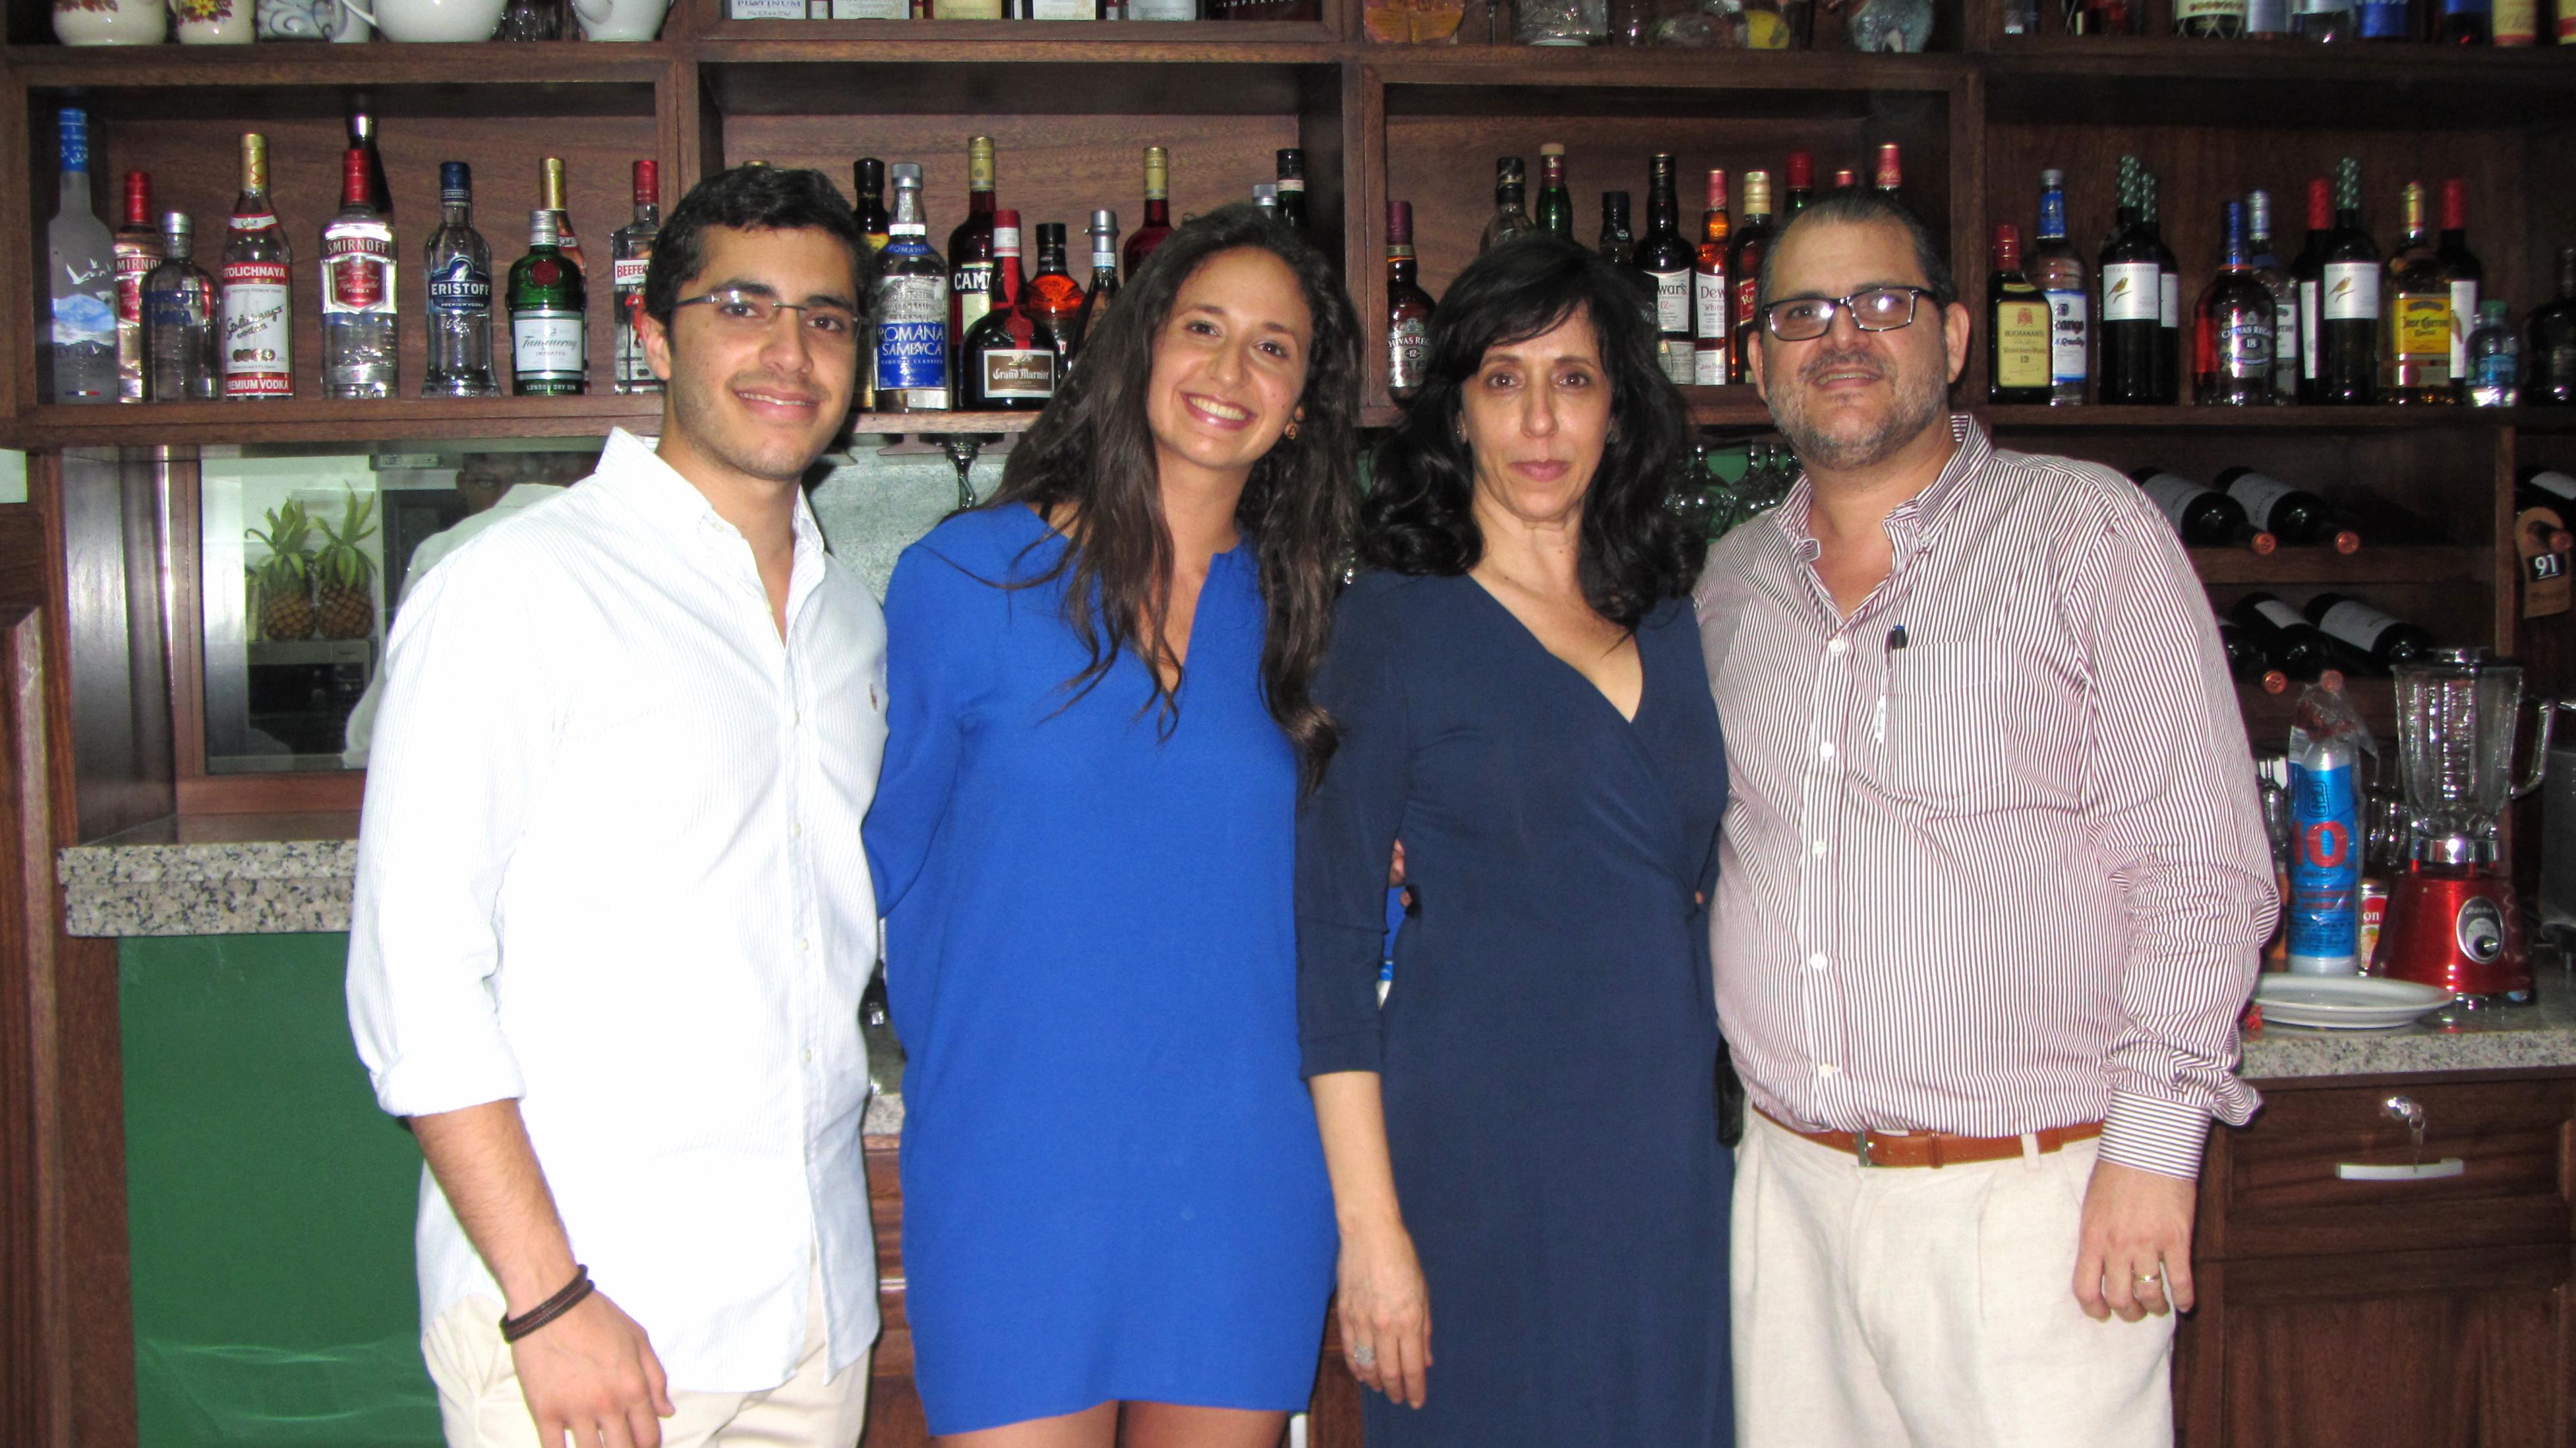 Giha family